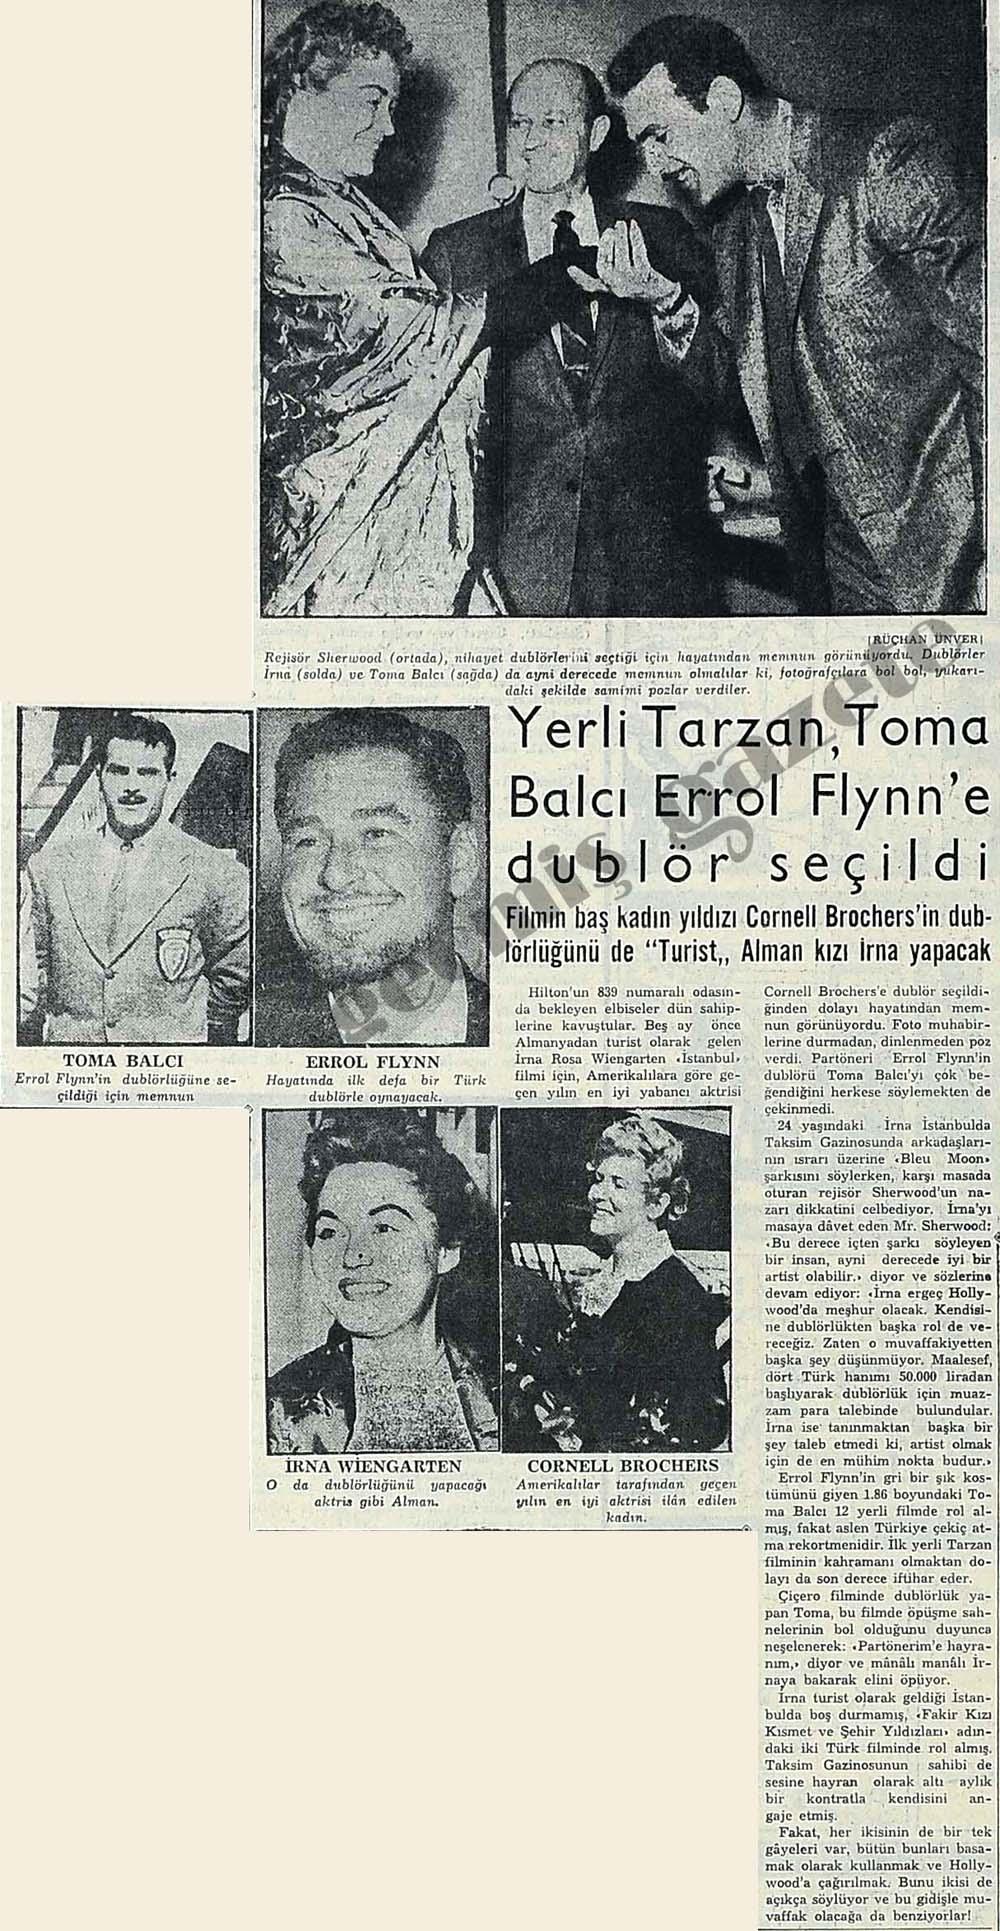 Yerli Tarzan, Toma Balcı Errol Flynn'e dublör olarak seçildi